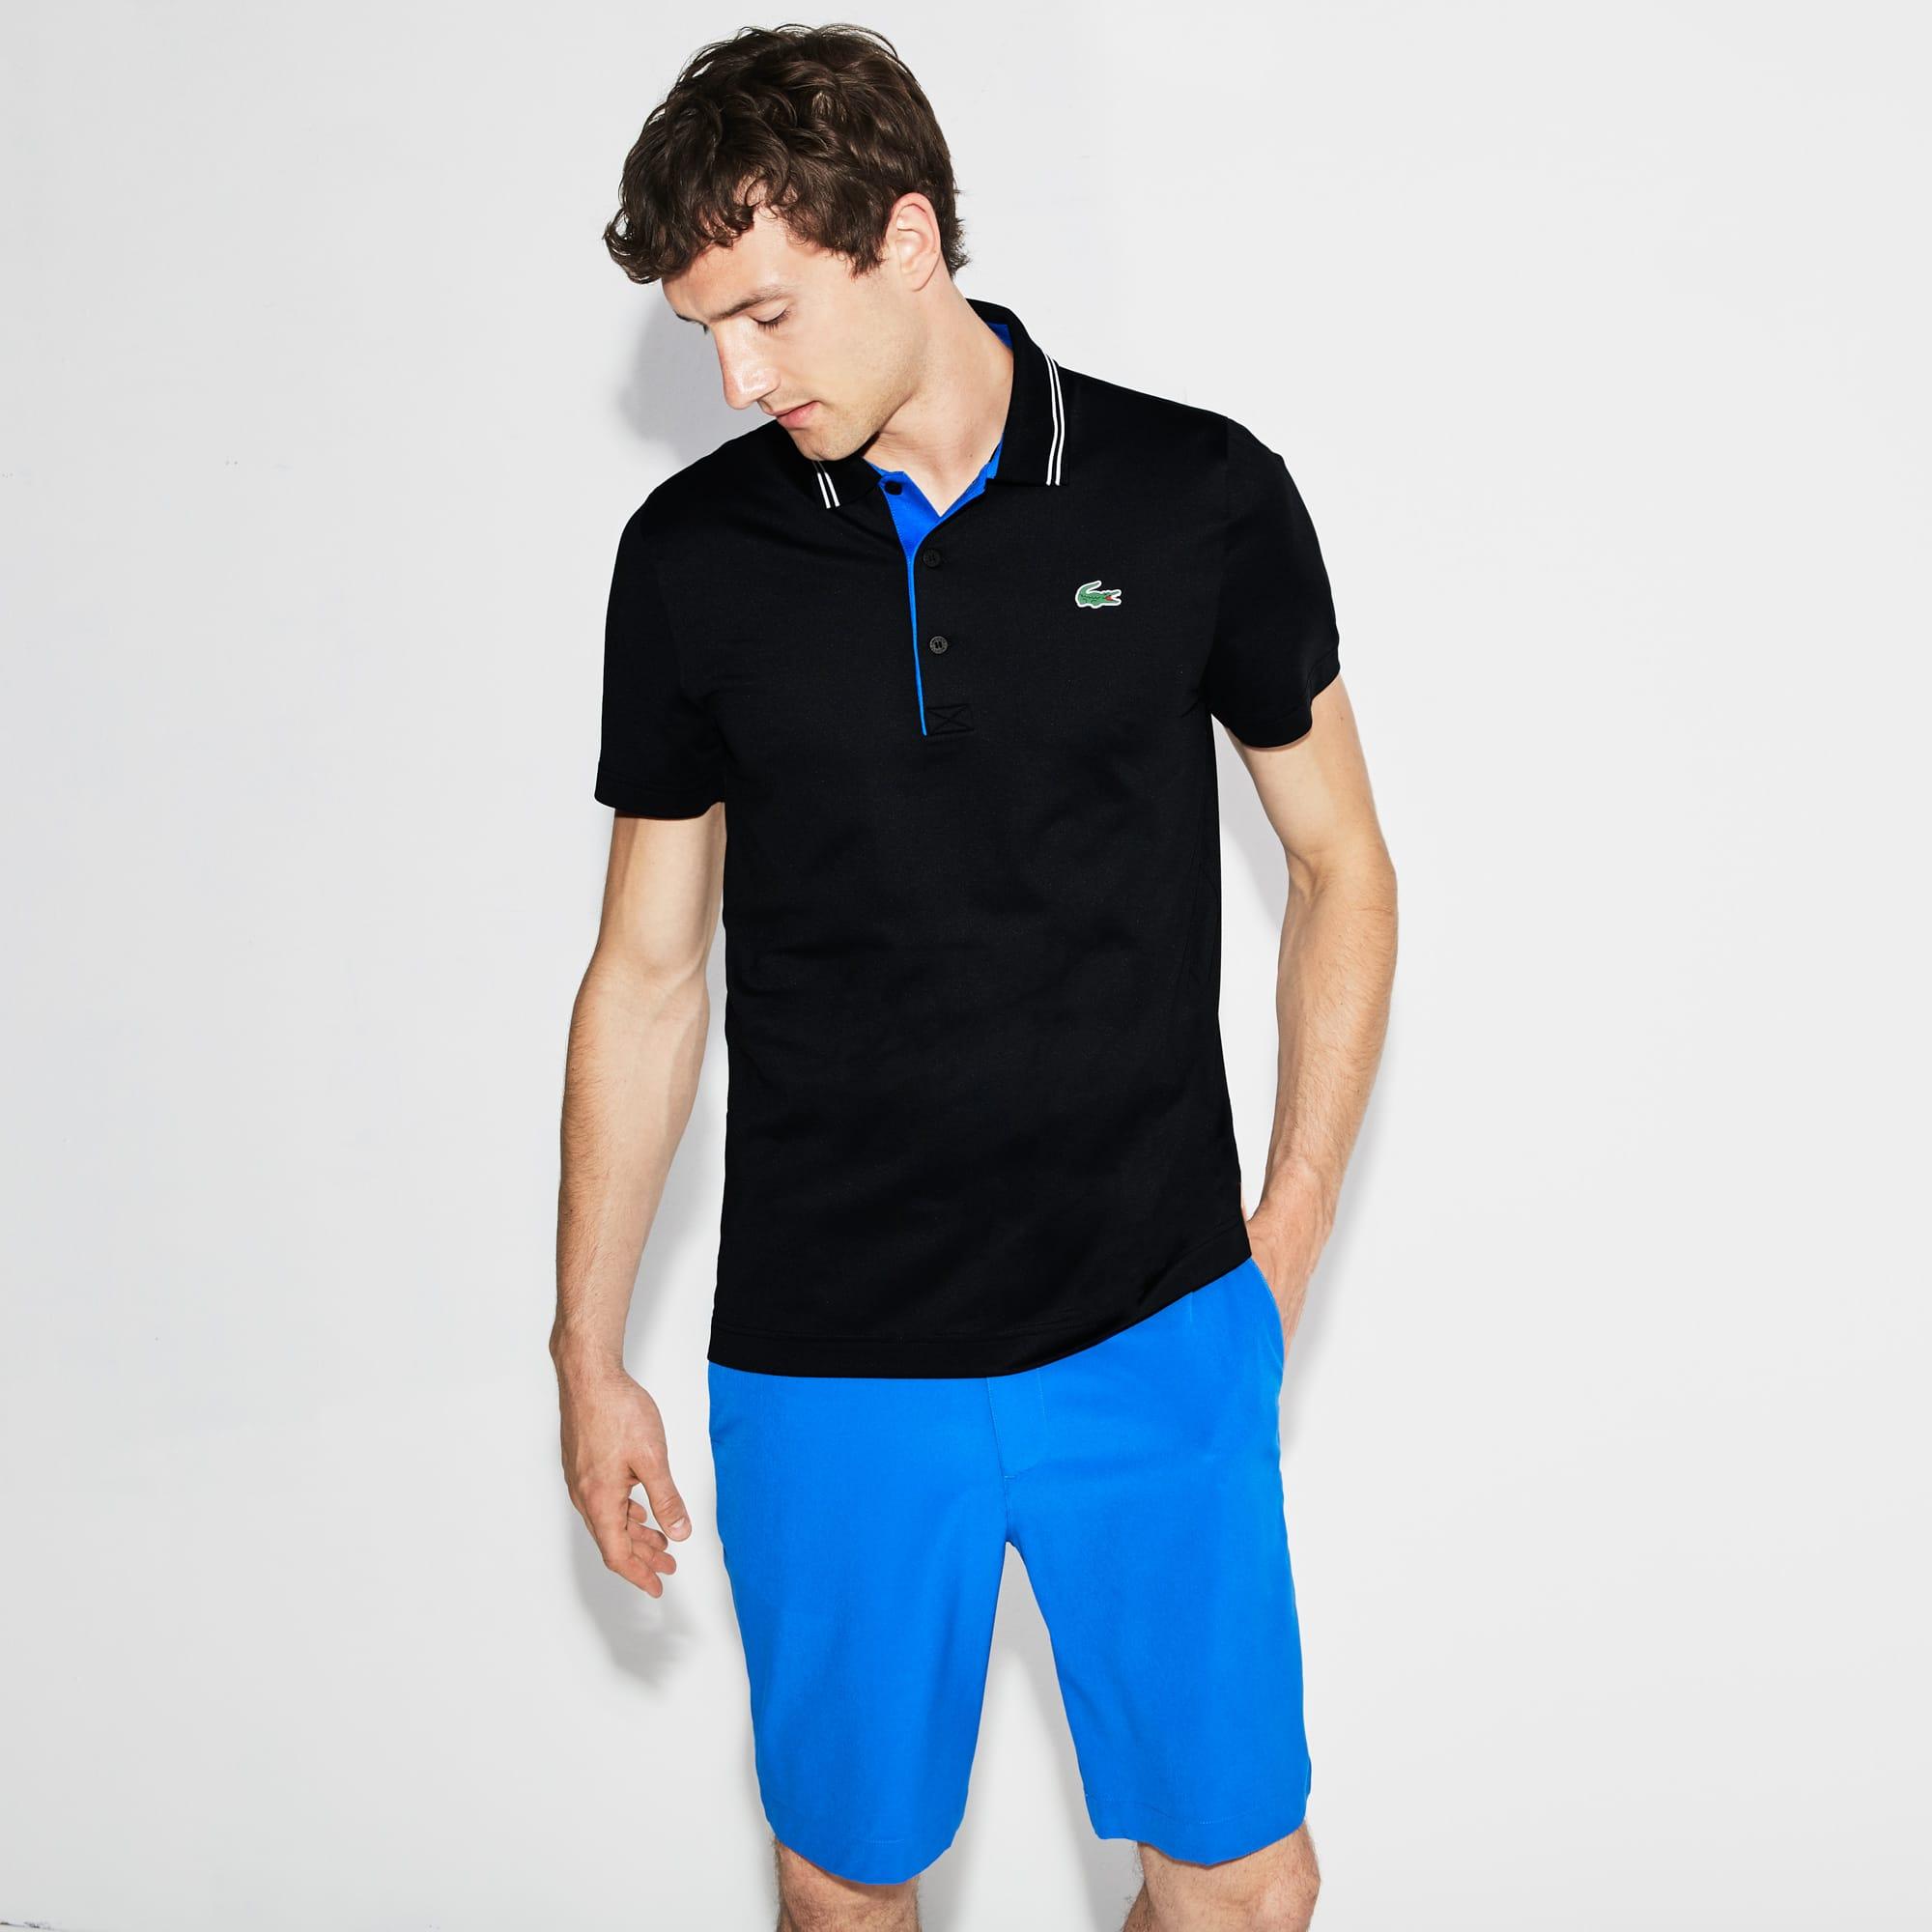 Polo Golf Lacoste SPORT en jersey stretch technique avec marquage